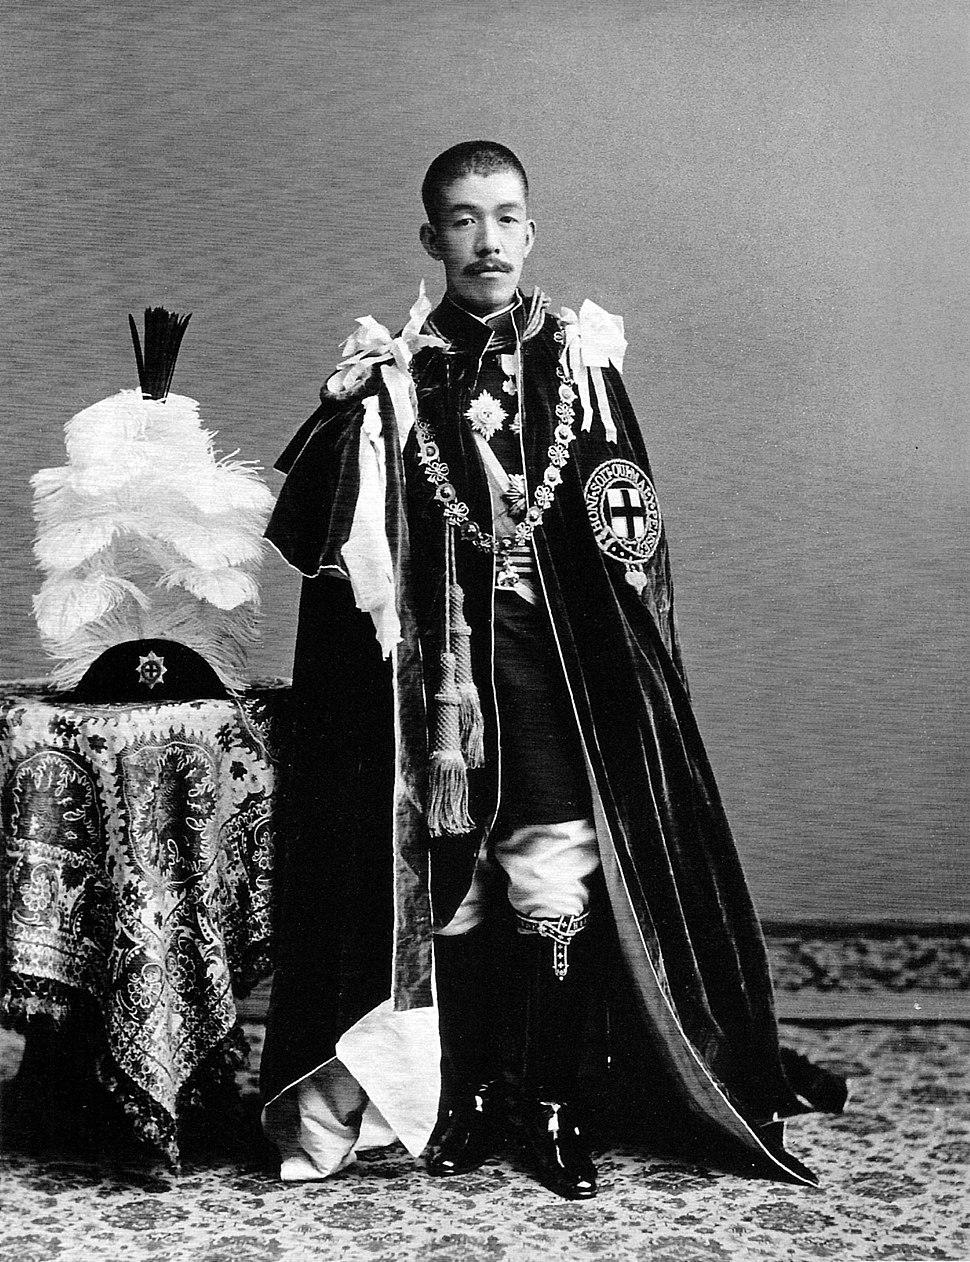 Emperor Taisho the Order of the Garter